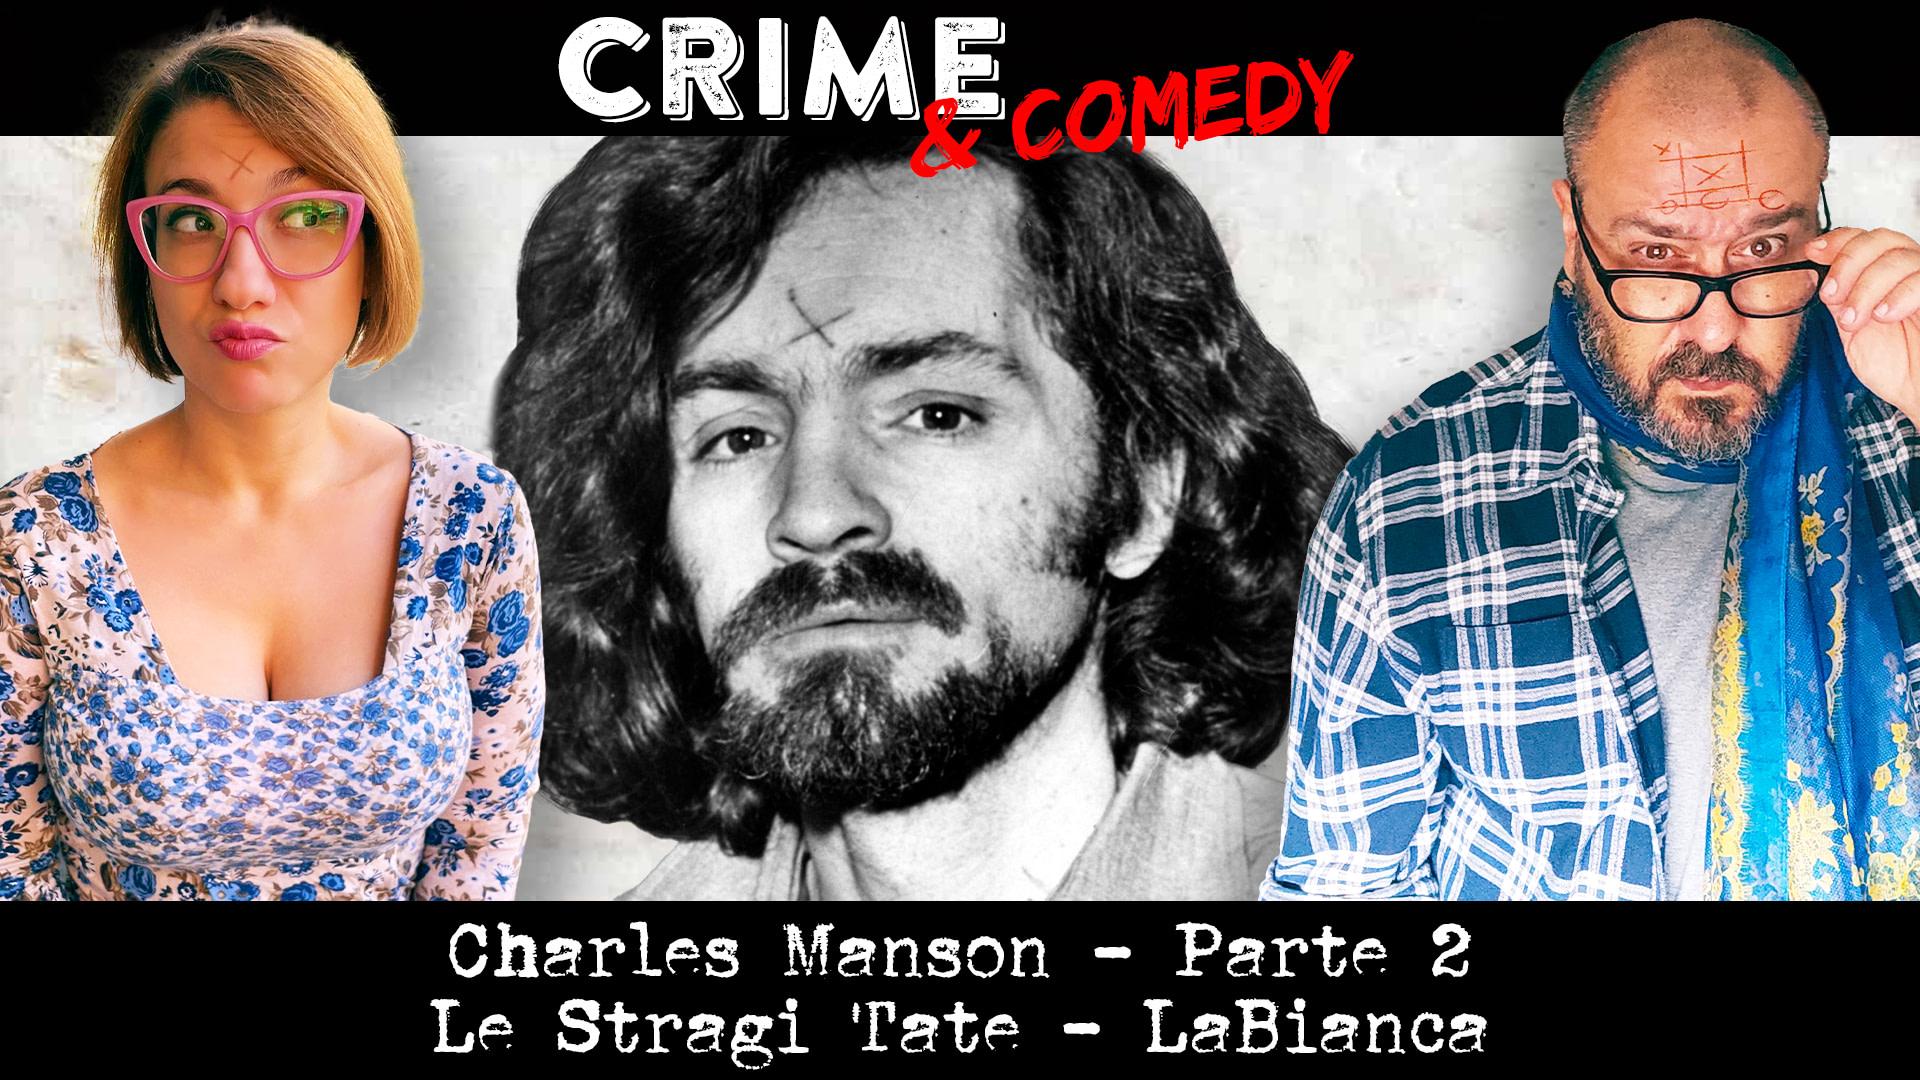 Charles Manson - Le Stragi Tate - LaBianca - Crime & Comedy Podcast